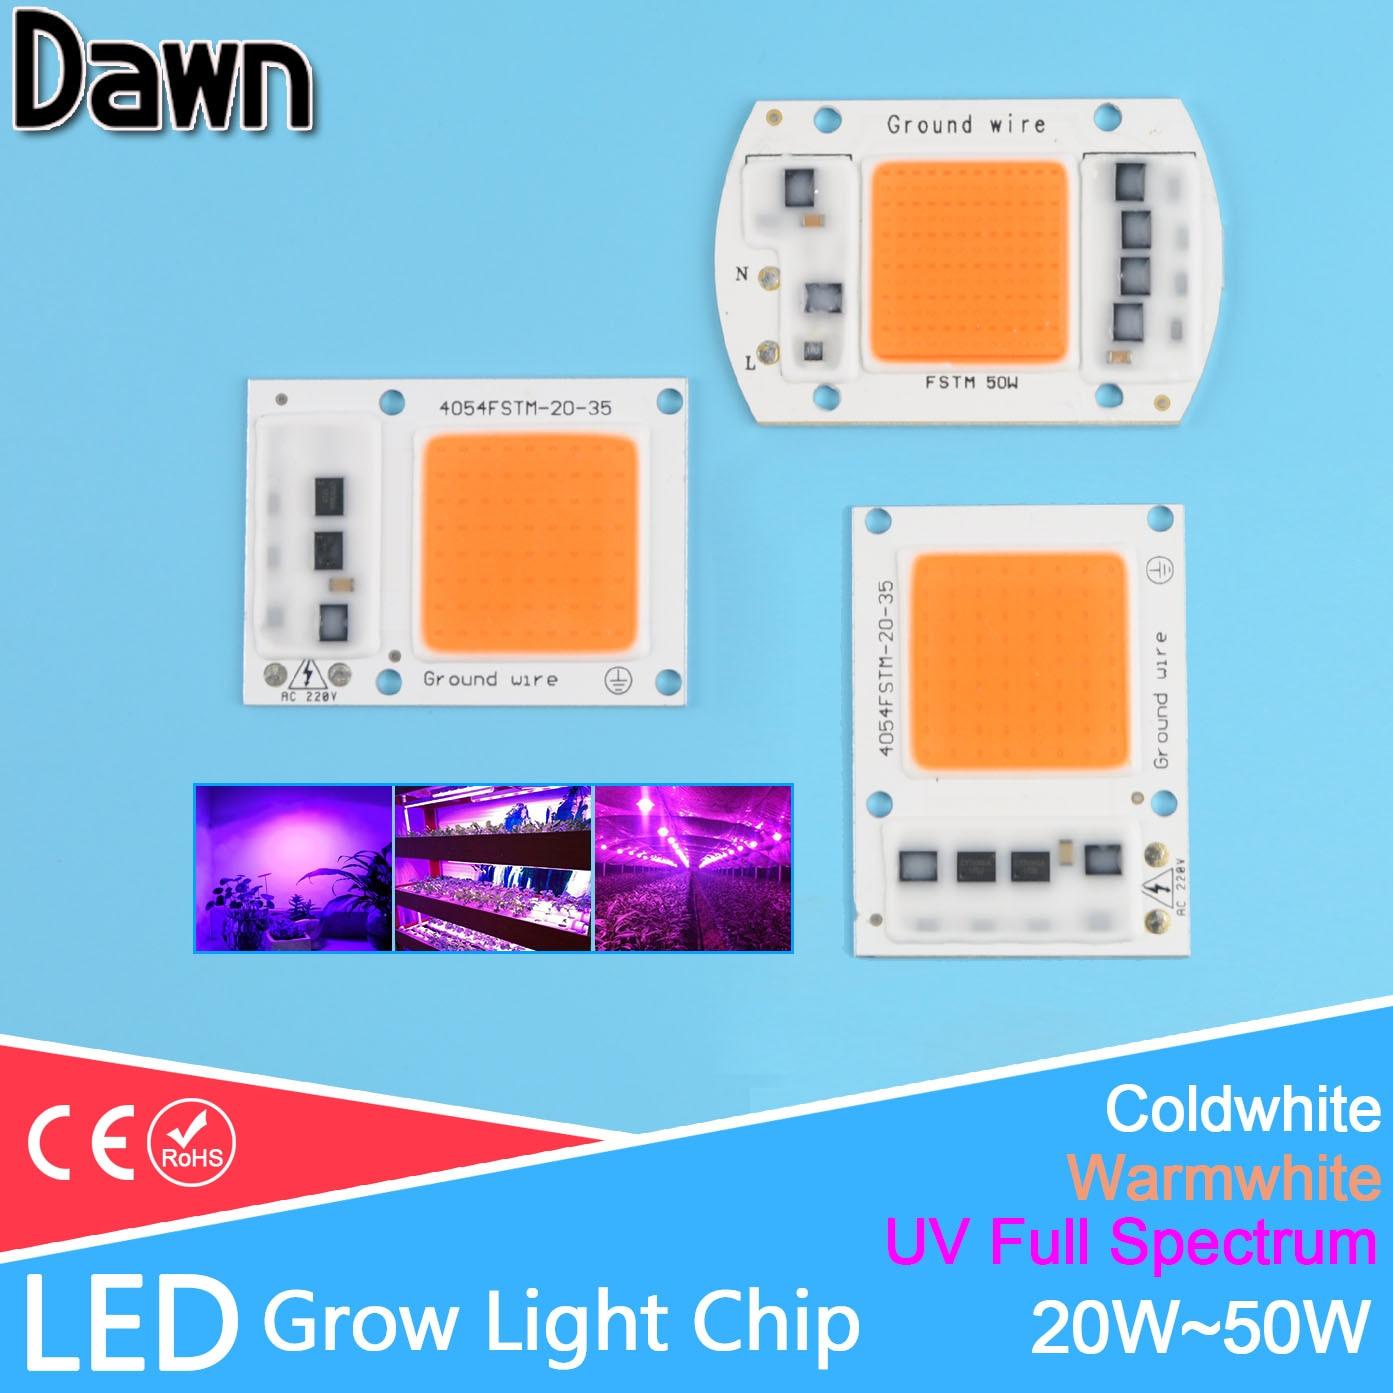 LED Grow Light Lamp Chip /UV Full Spectrum/Warmwhite/Coldwhite 220V 20W 30W 50W For Flower Plant Hydroponics Seedling Greenhouse